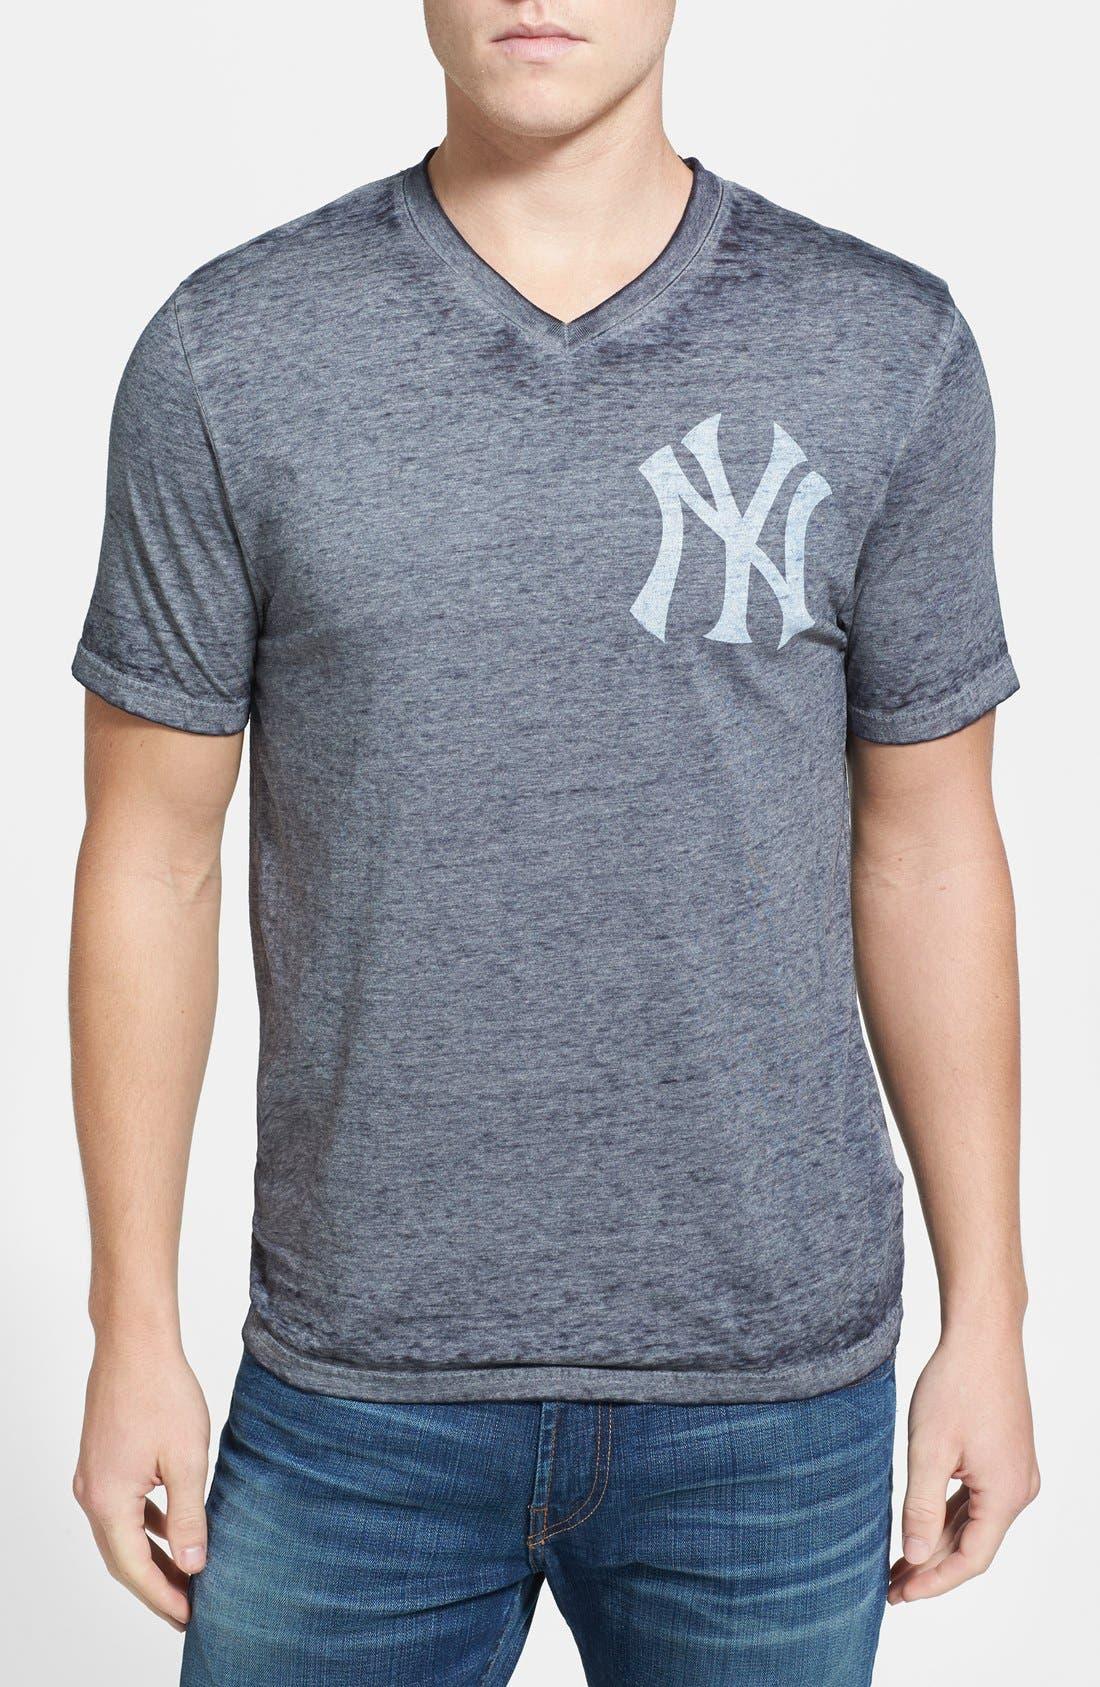 Main Image - Red Jacket 'New York Yankees - Burnout' V-Neck T-Shirt